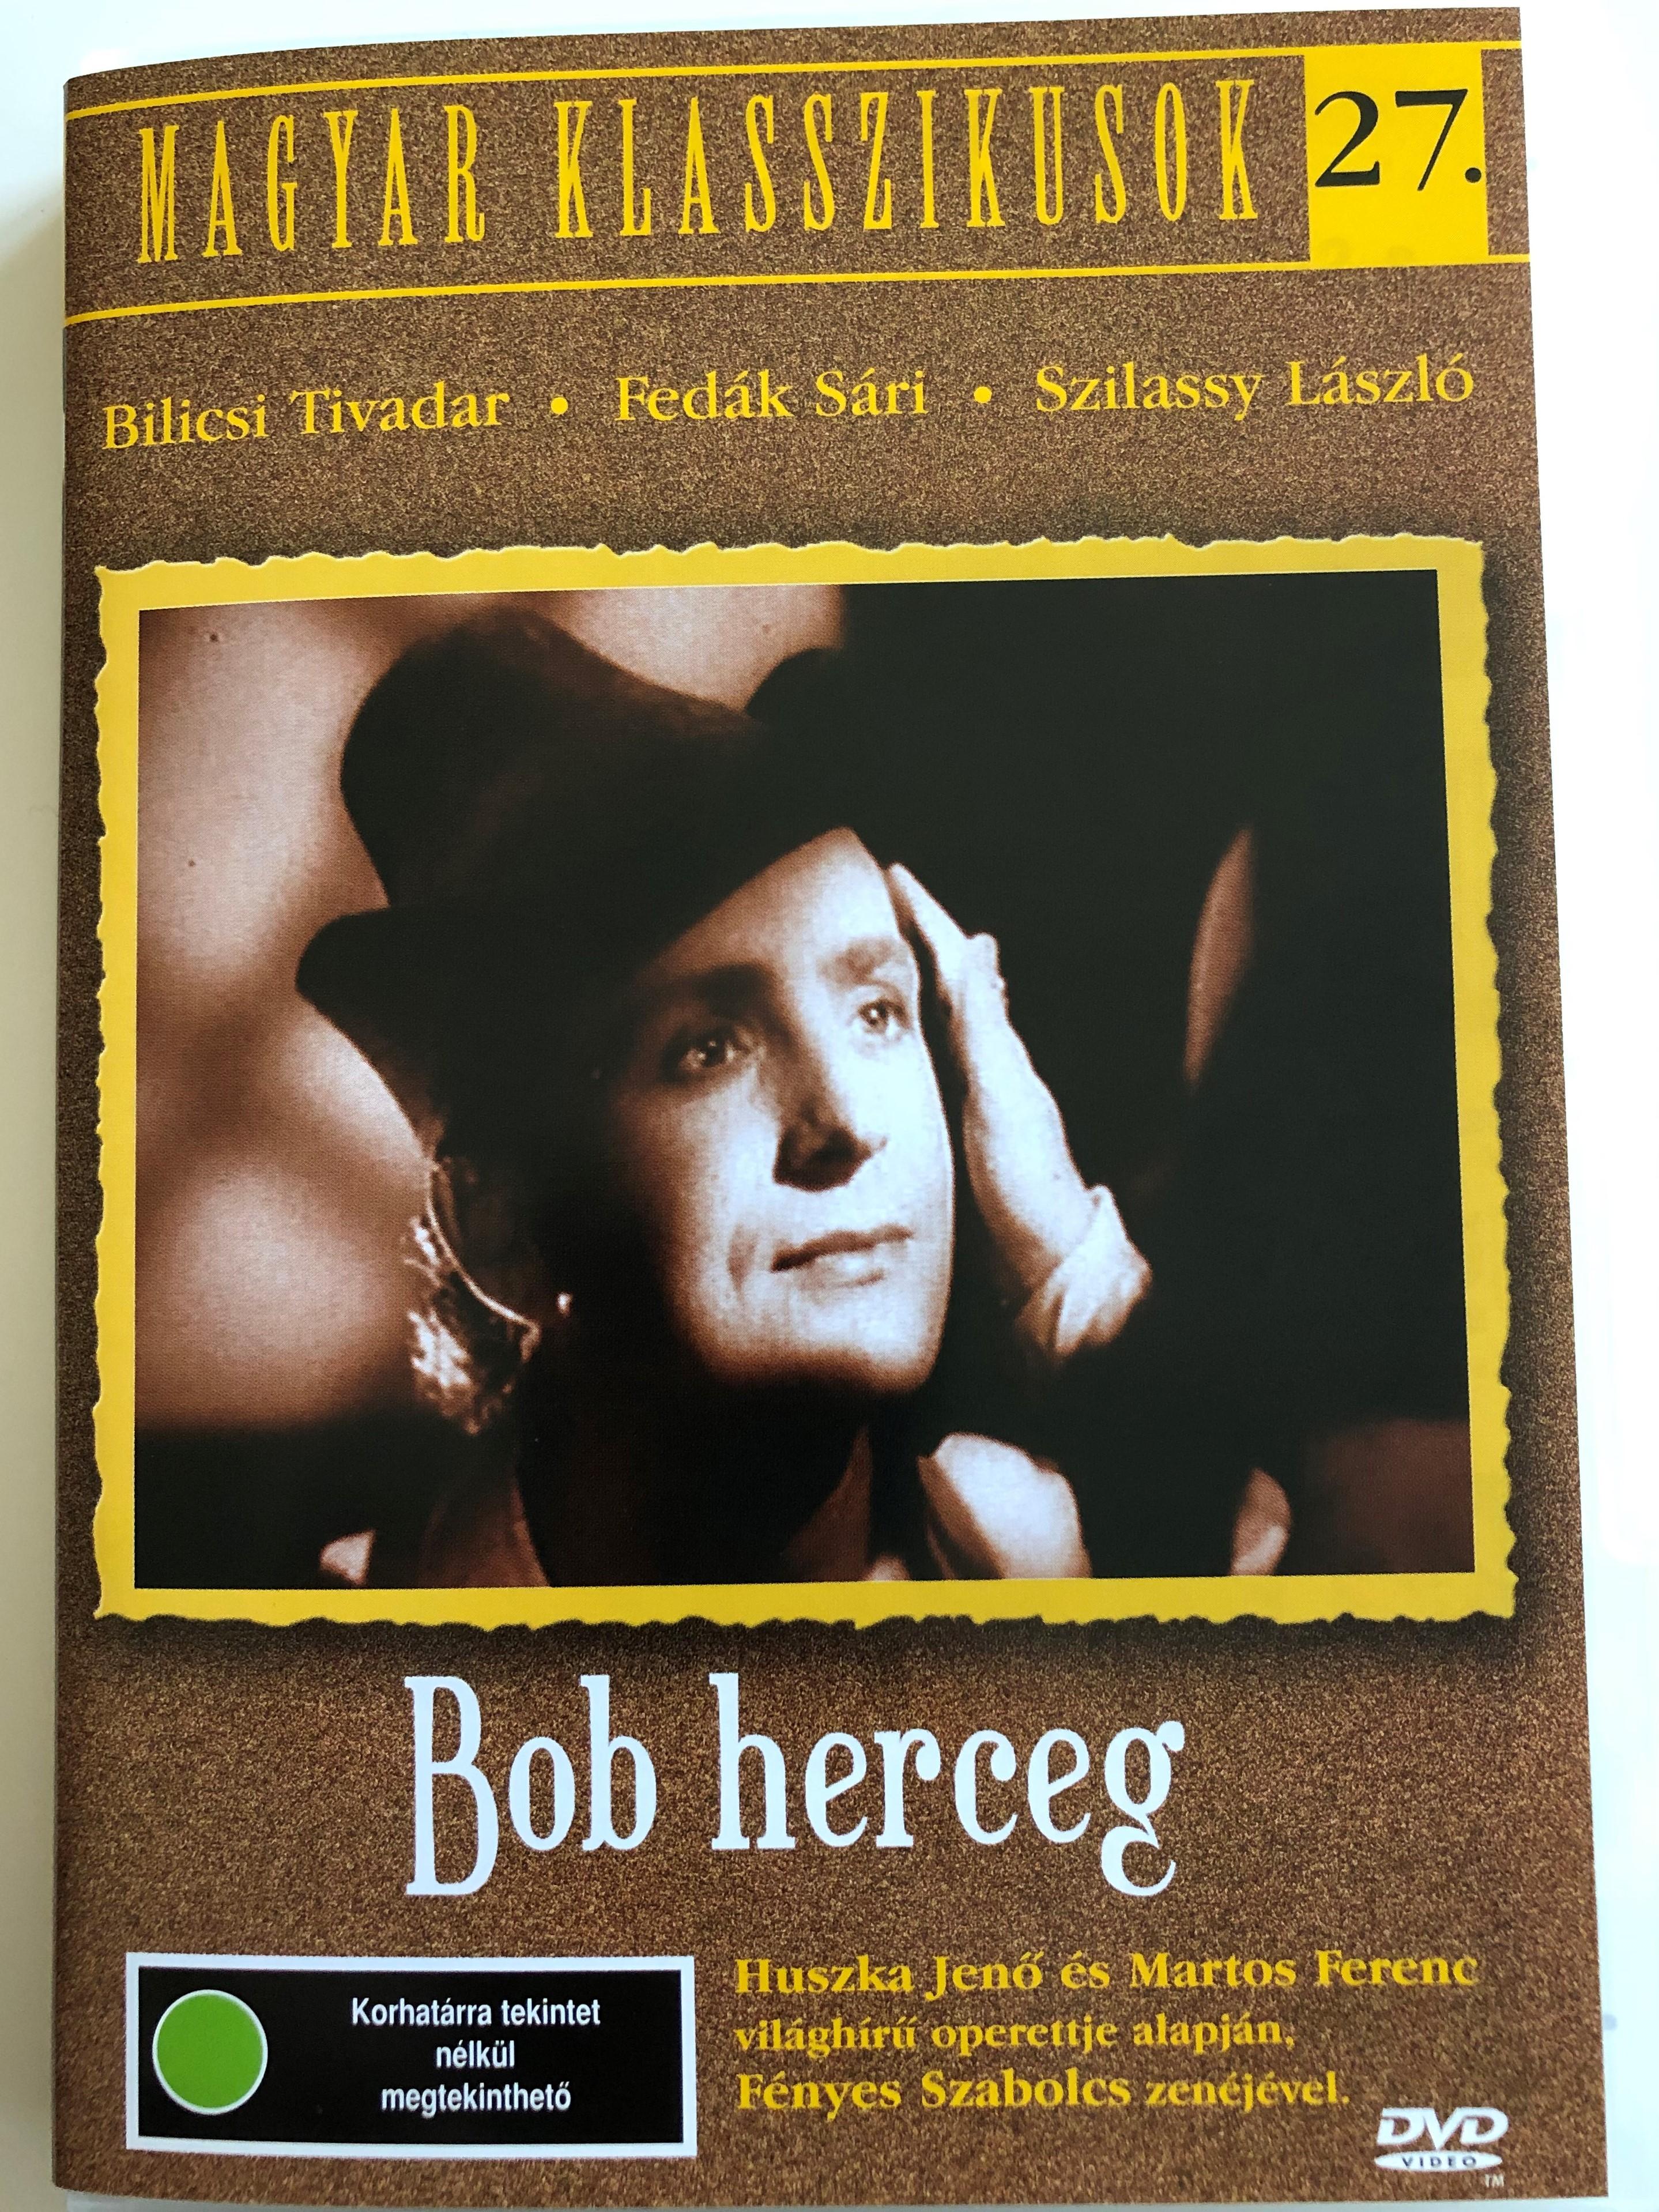 bob-herceg-dvd-1941-prince-bob-directed-by-kalm-r-l-szl-starring-szilassy-l-szl-simor-erzsi-greguss-zolt-n-makl-ry-zolt-n-bilicsi-tivadar-rajnai-g-bor-hungarian-classics-27.-1-.jpg